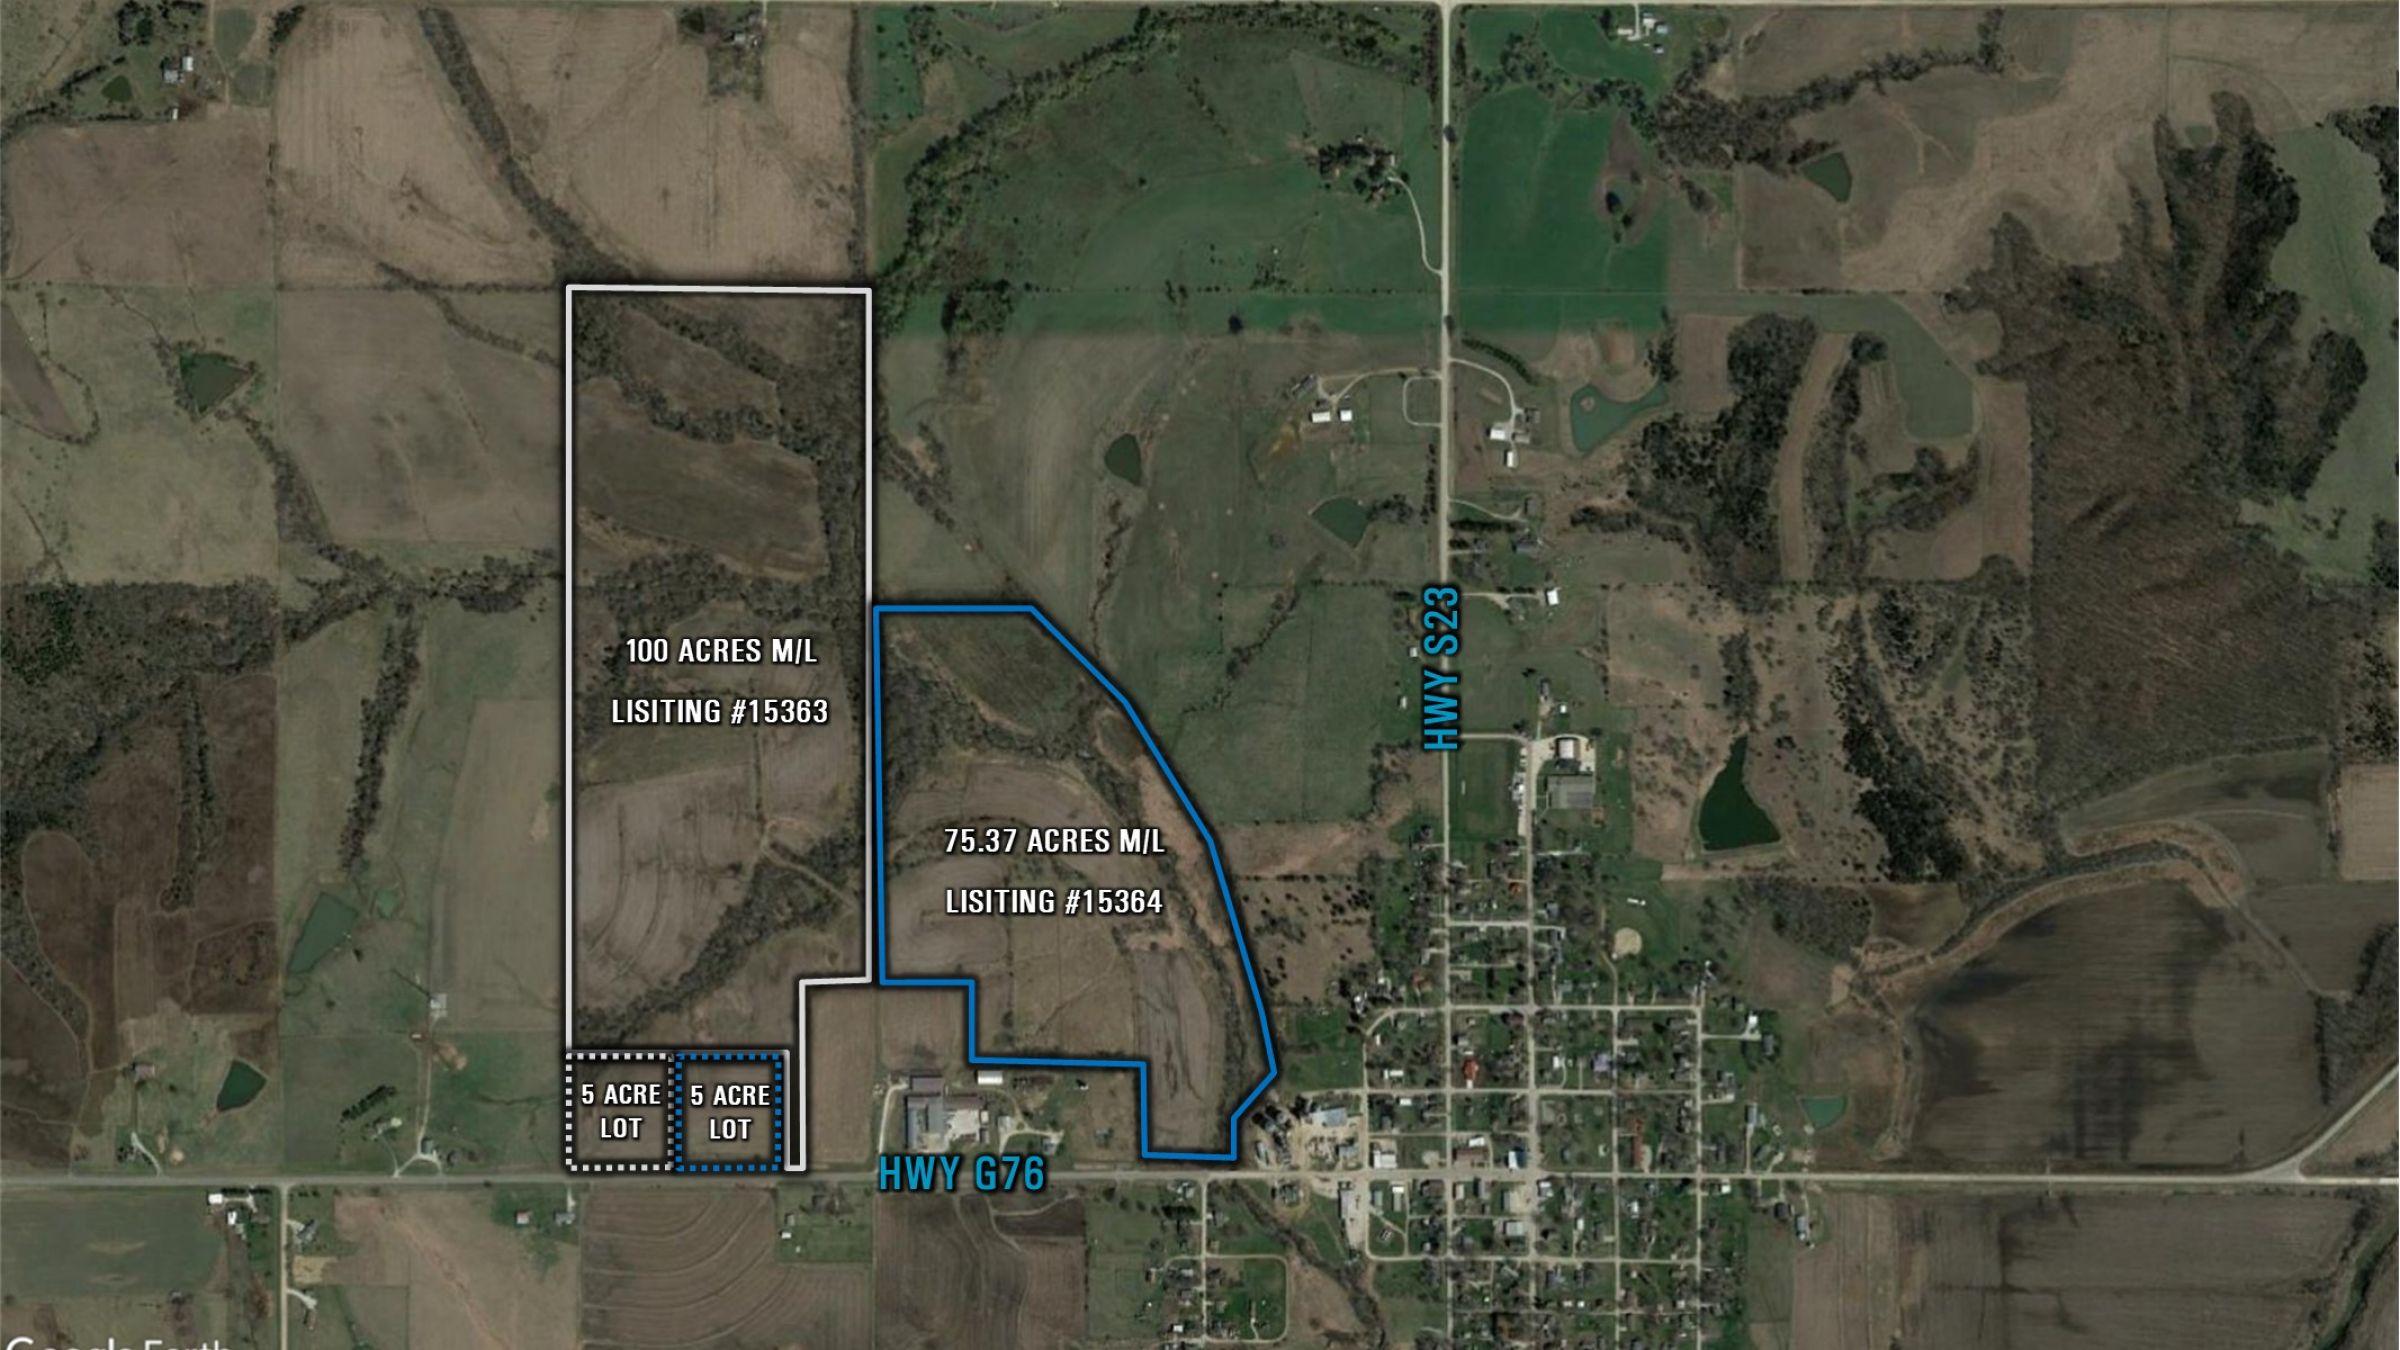 land-warren-county-iowa-5-acres-listing-number-15401-0-2021-03-08-174614.jpg